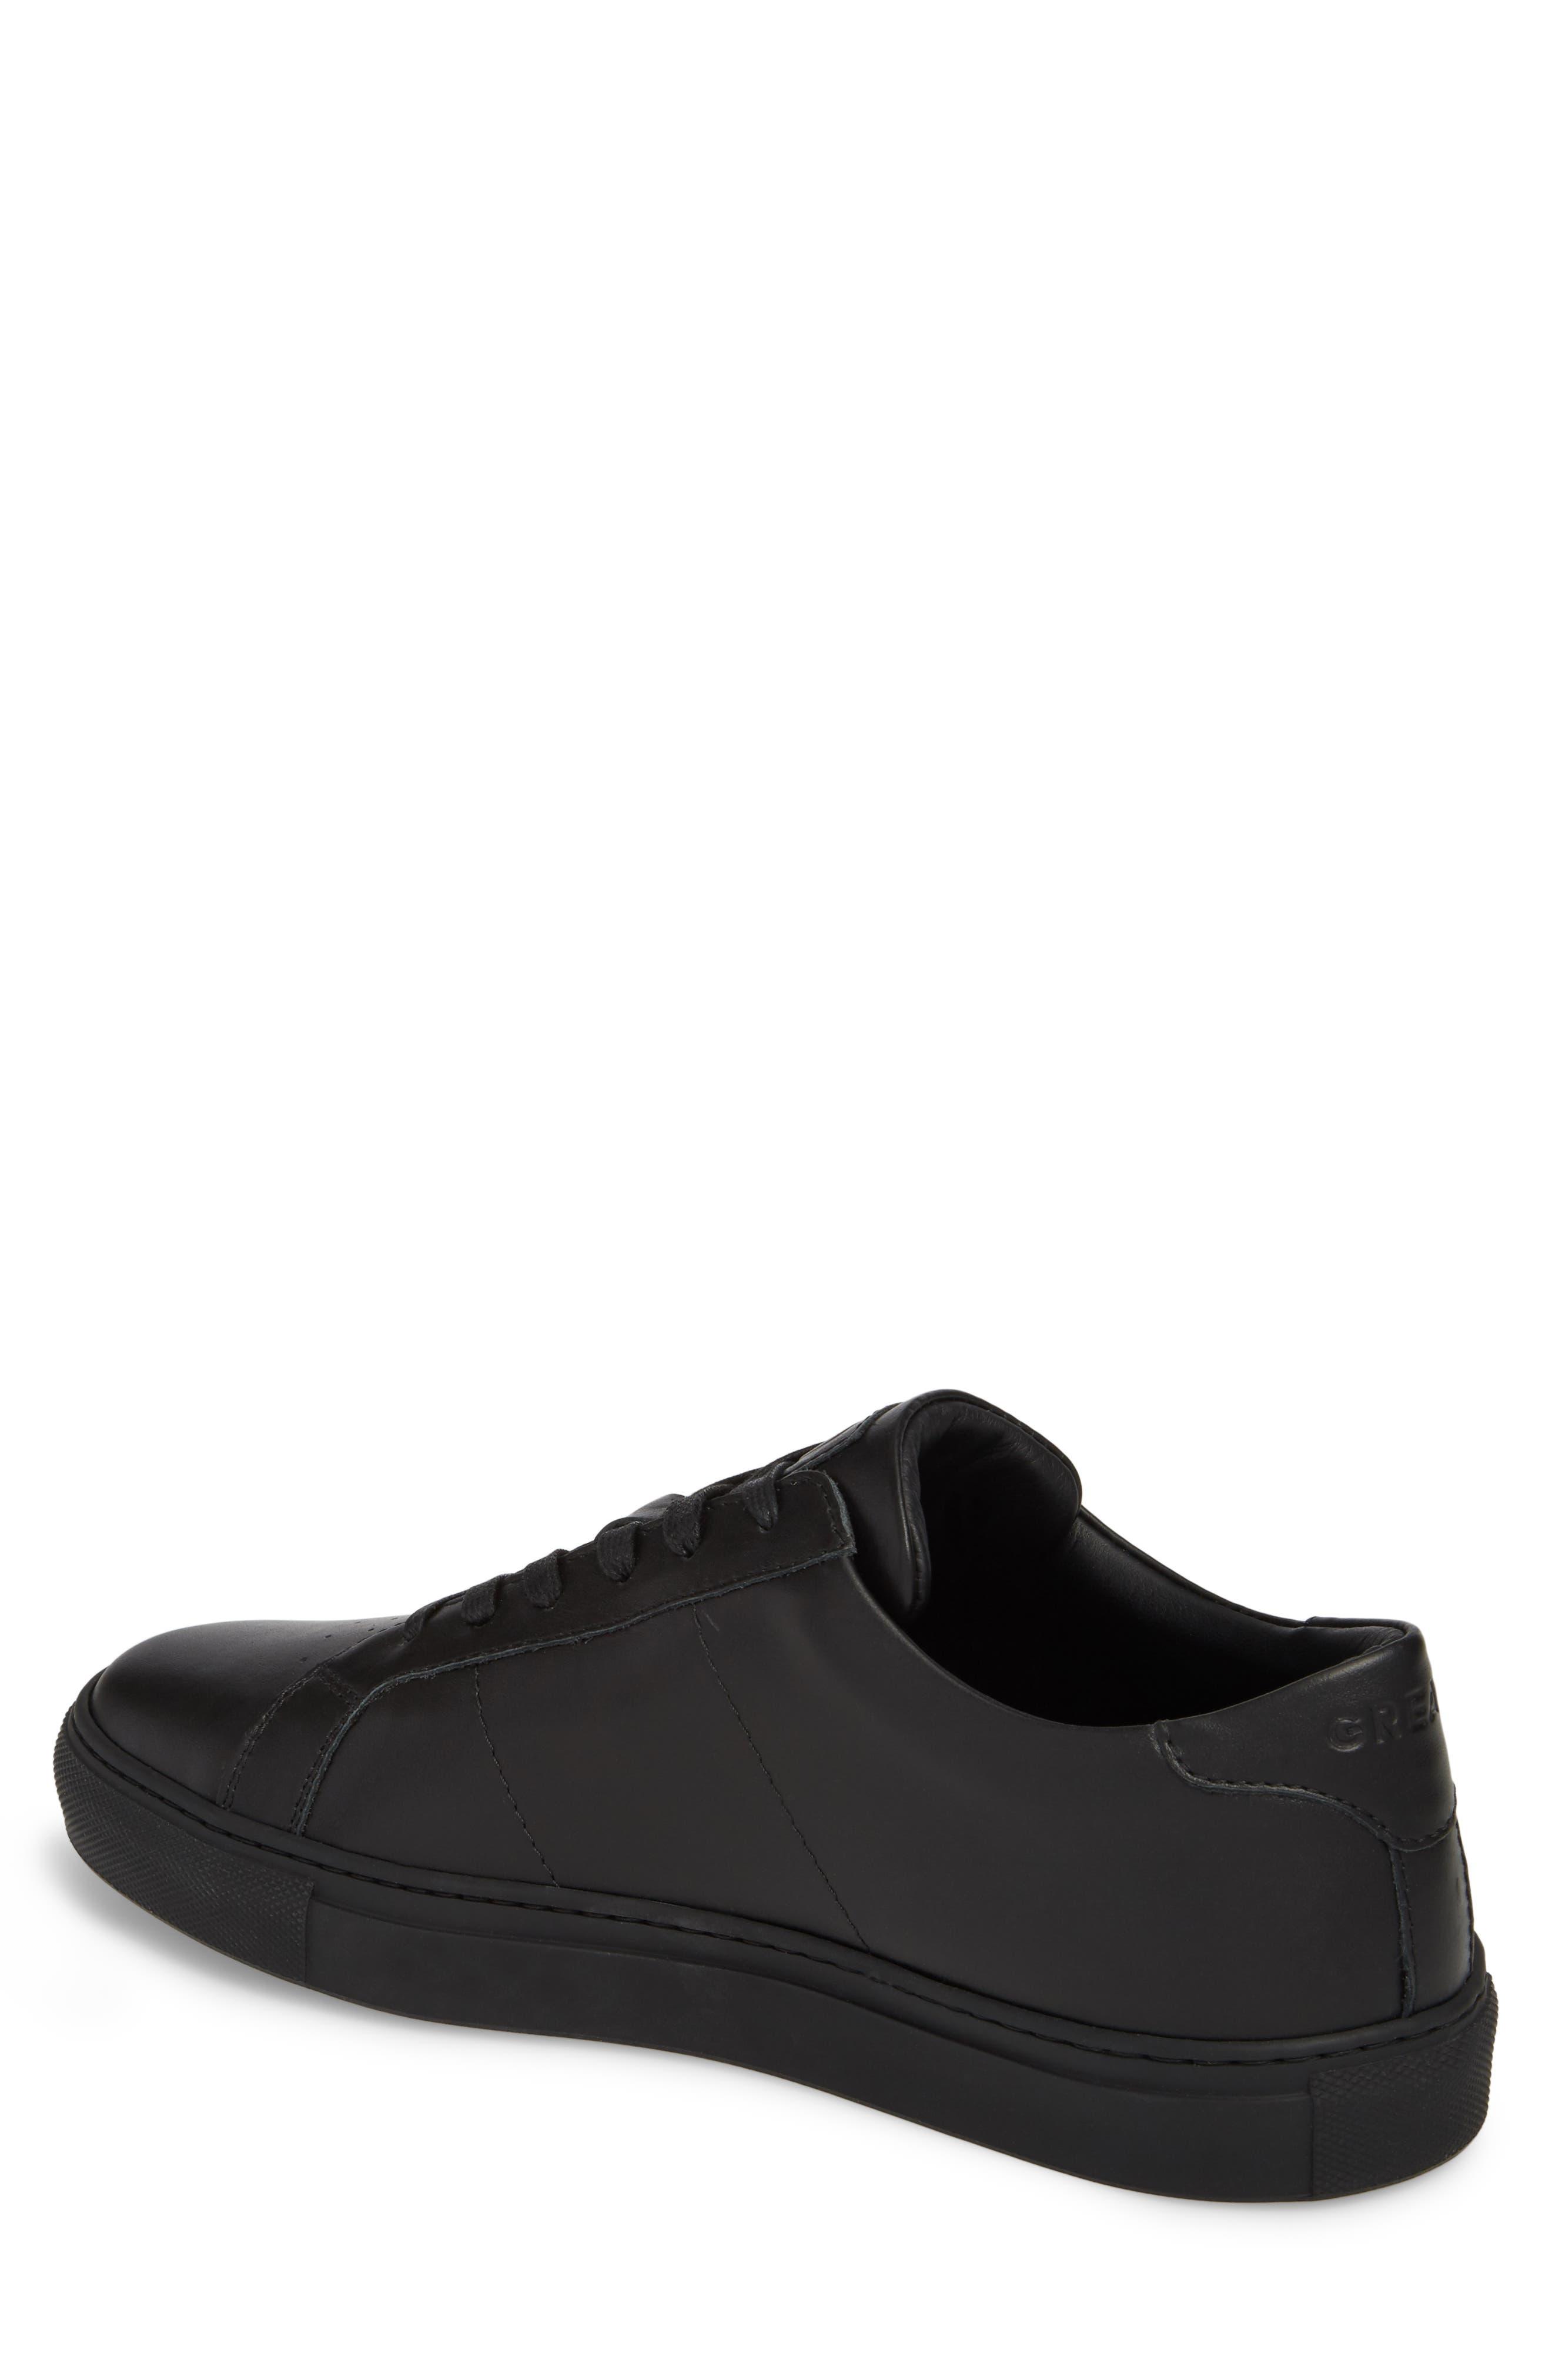 Alternate Image 2  - Greats Royale Sneaker (Men)